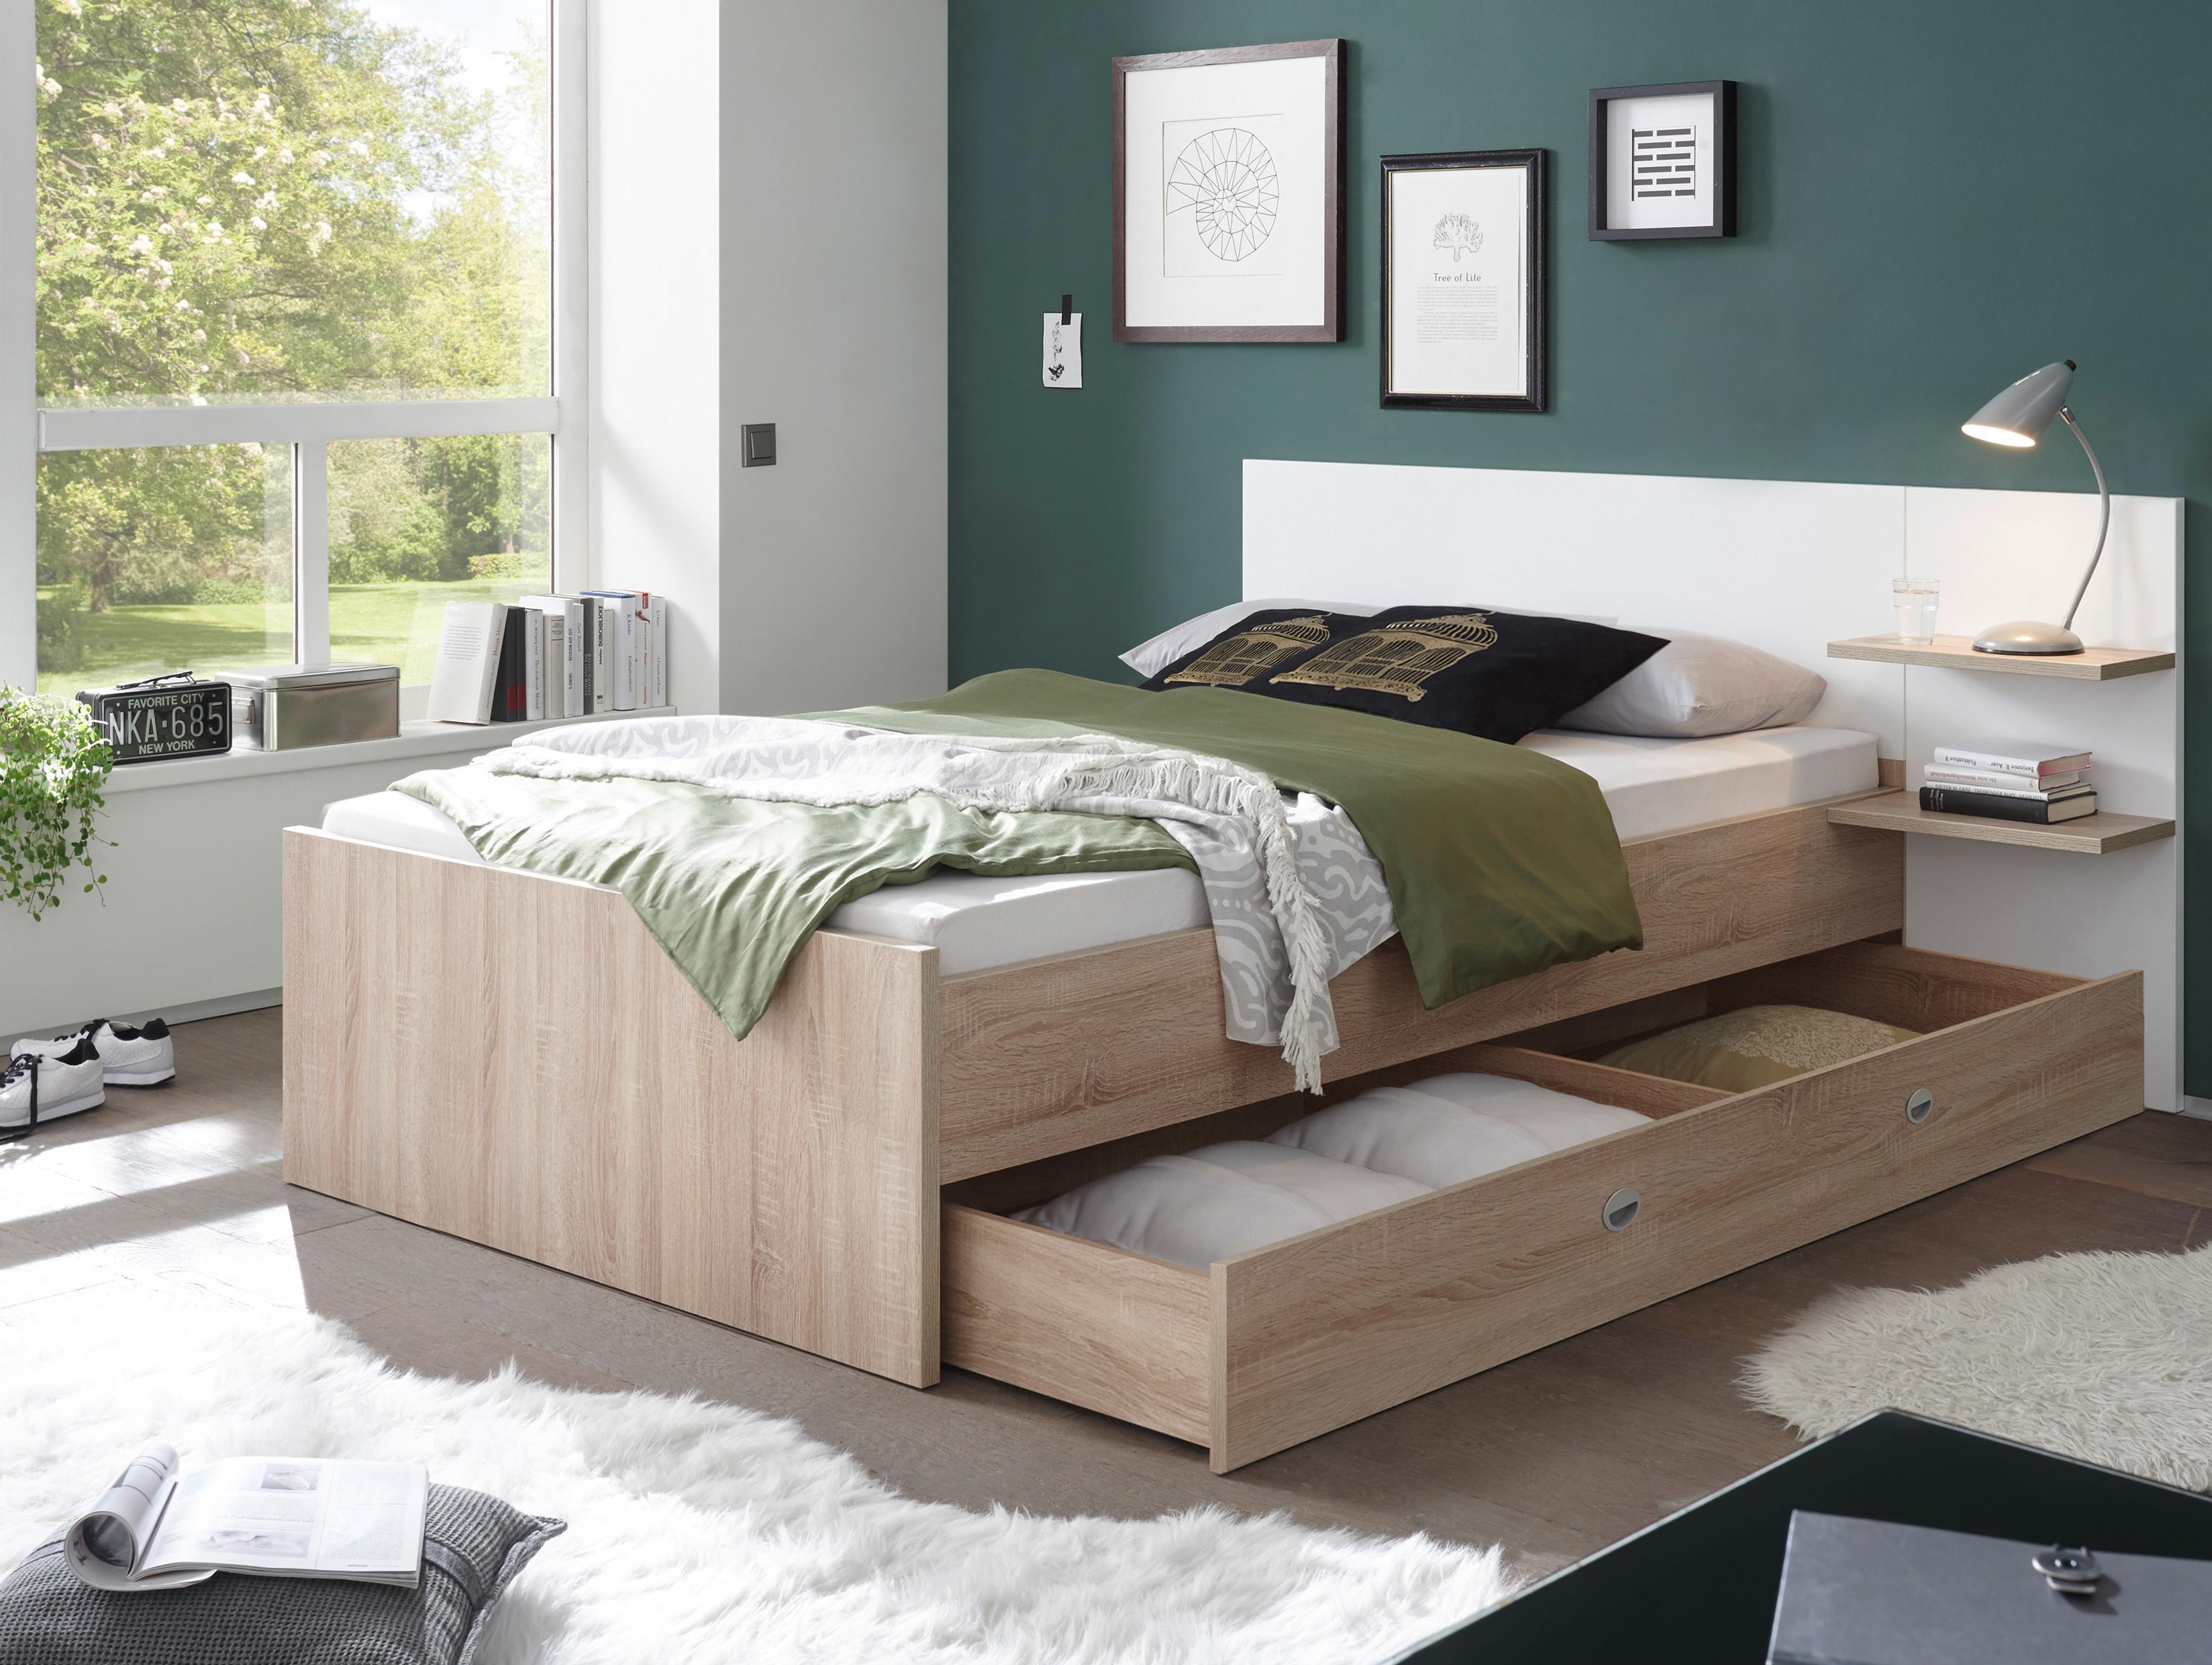 piana einzelbett 90x200 cm material dekorspanplatte. Black Bedroom Furniture Sets. Home Design Ideas